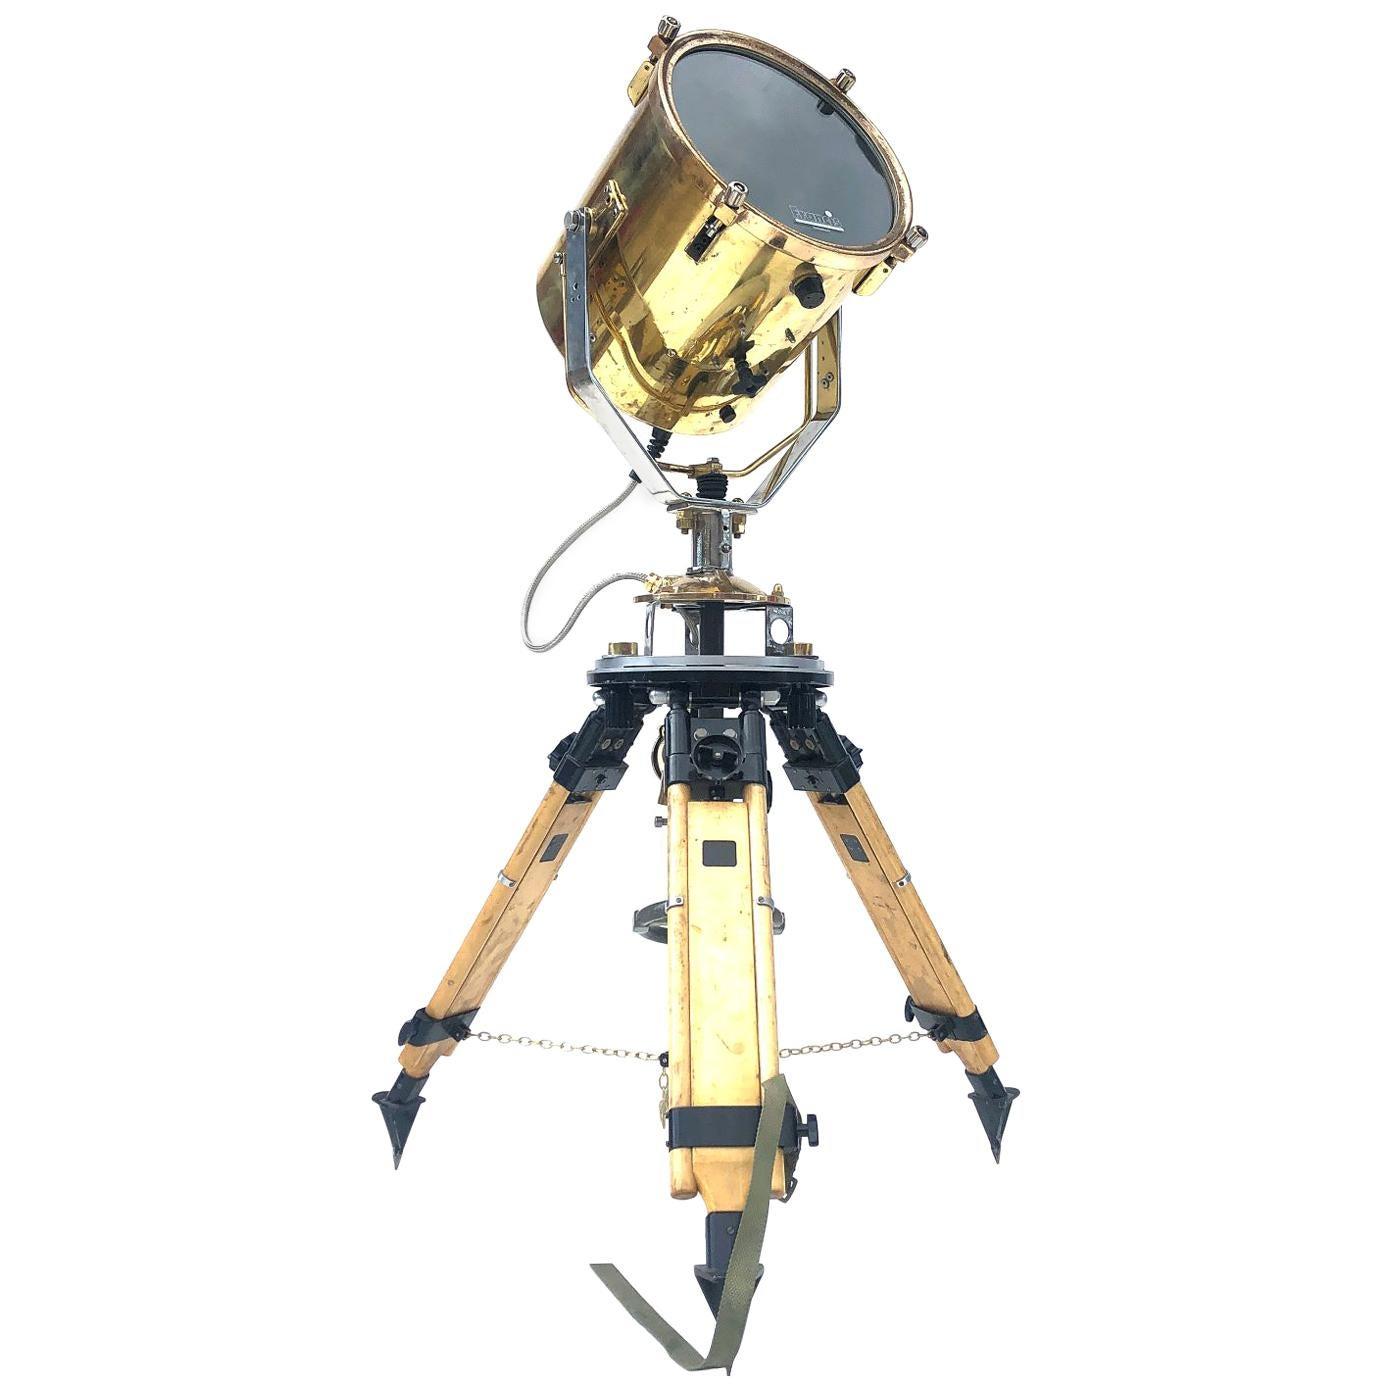 1980s Francis British Brass Search Light Russian Military Gyroscope Tripod Lamp